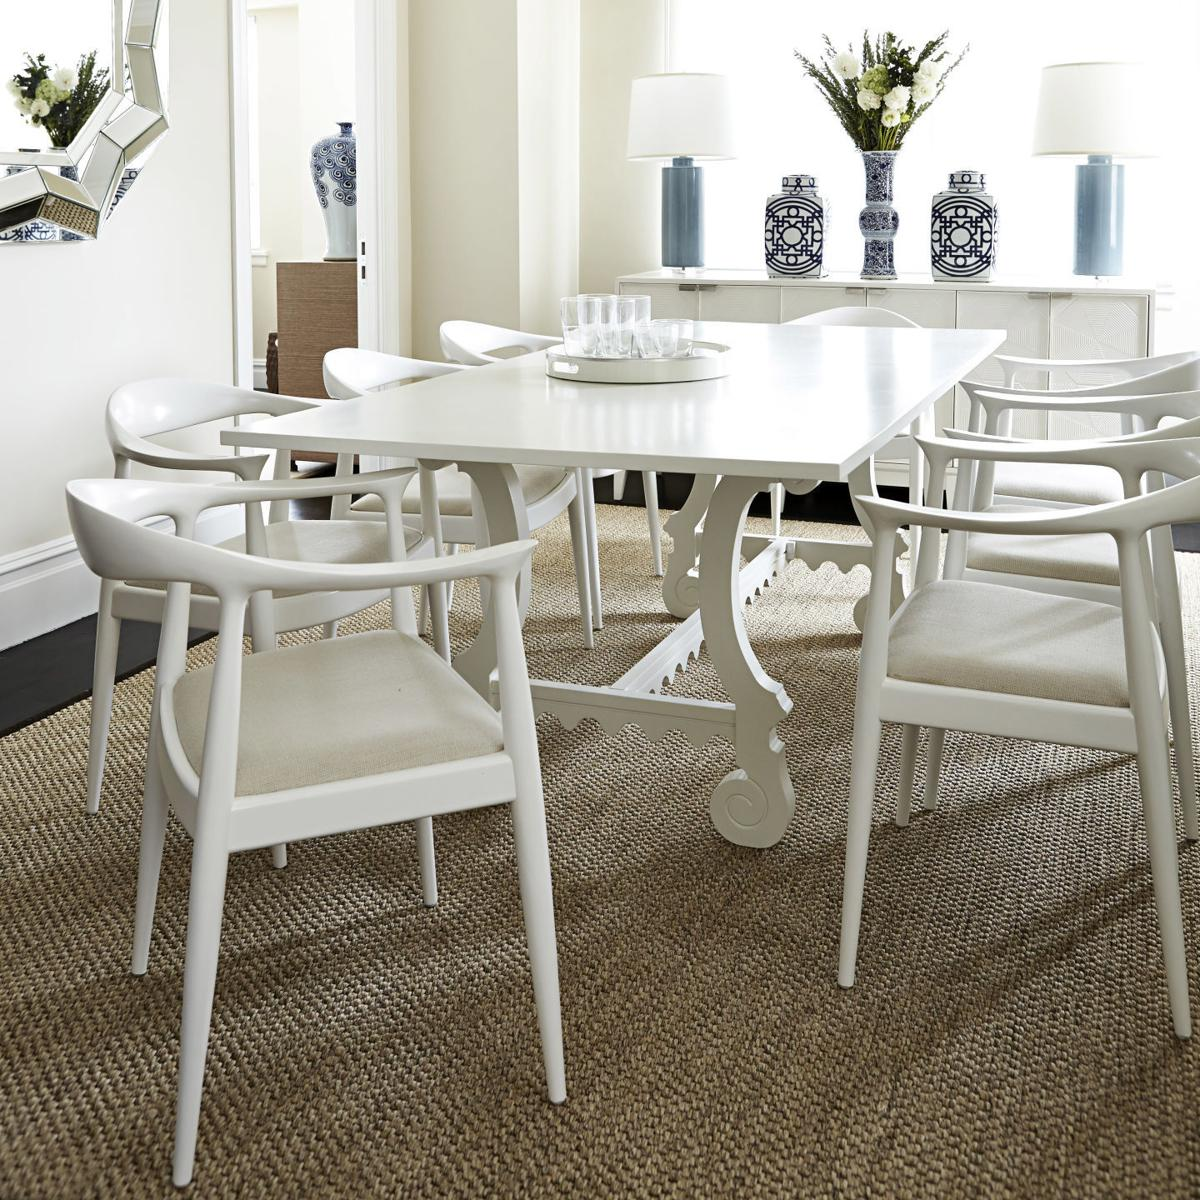 design-dining-58a118ba-e975-11e6-80c2-30e57e57e05d.jpg